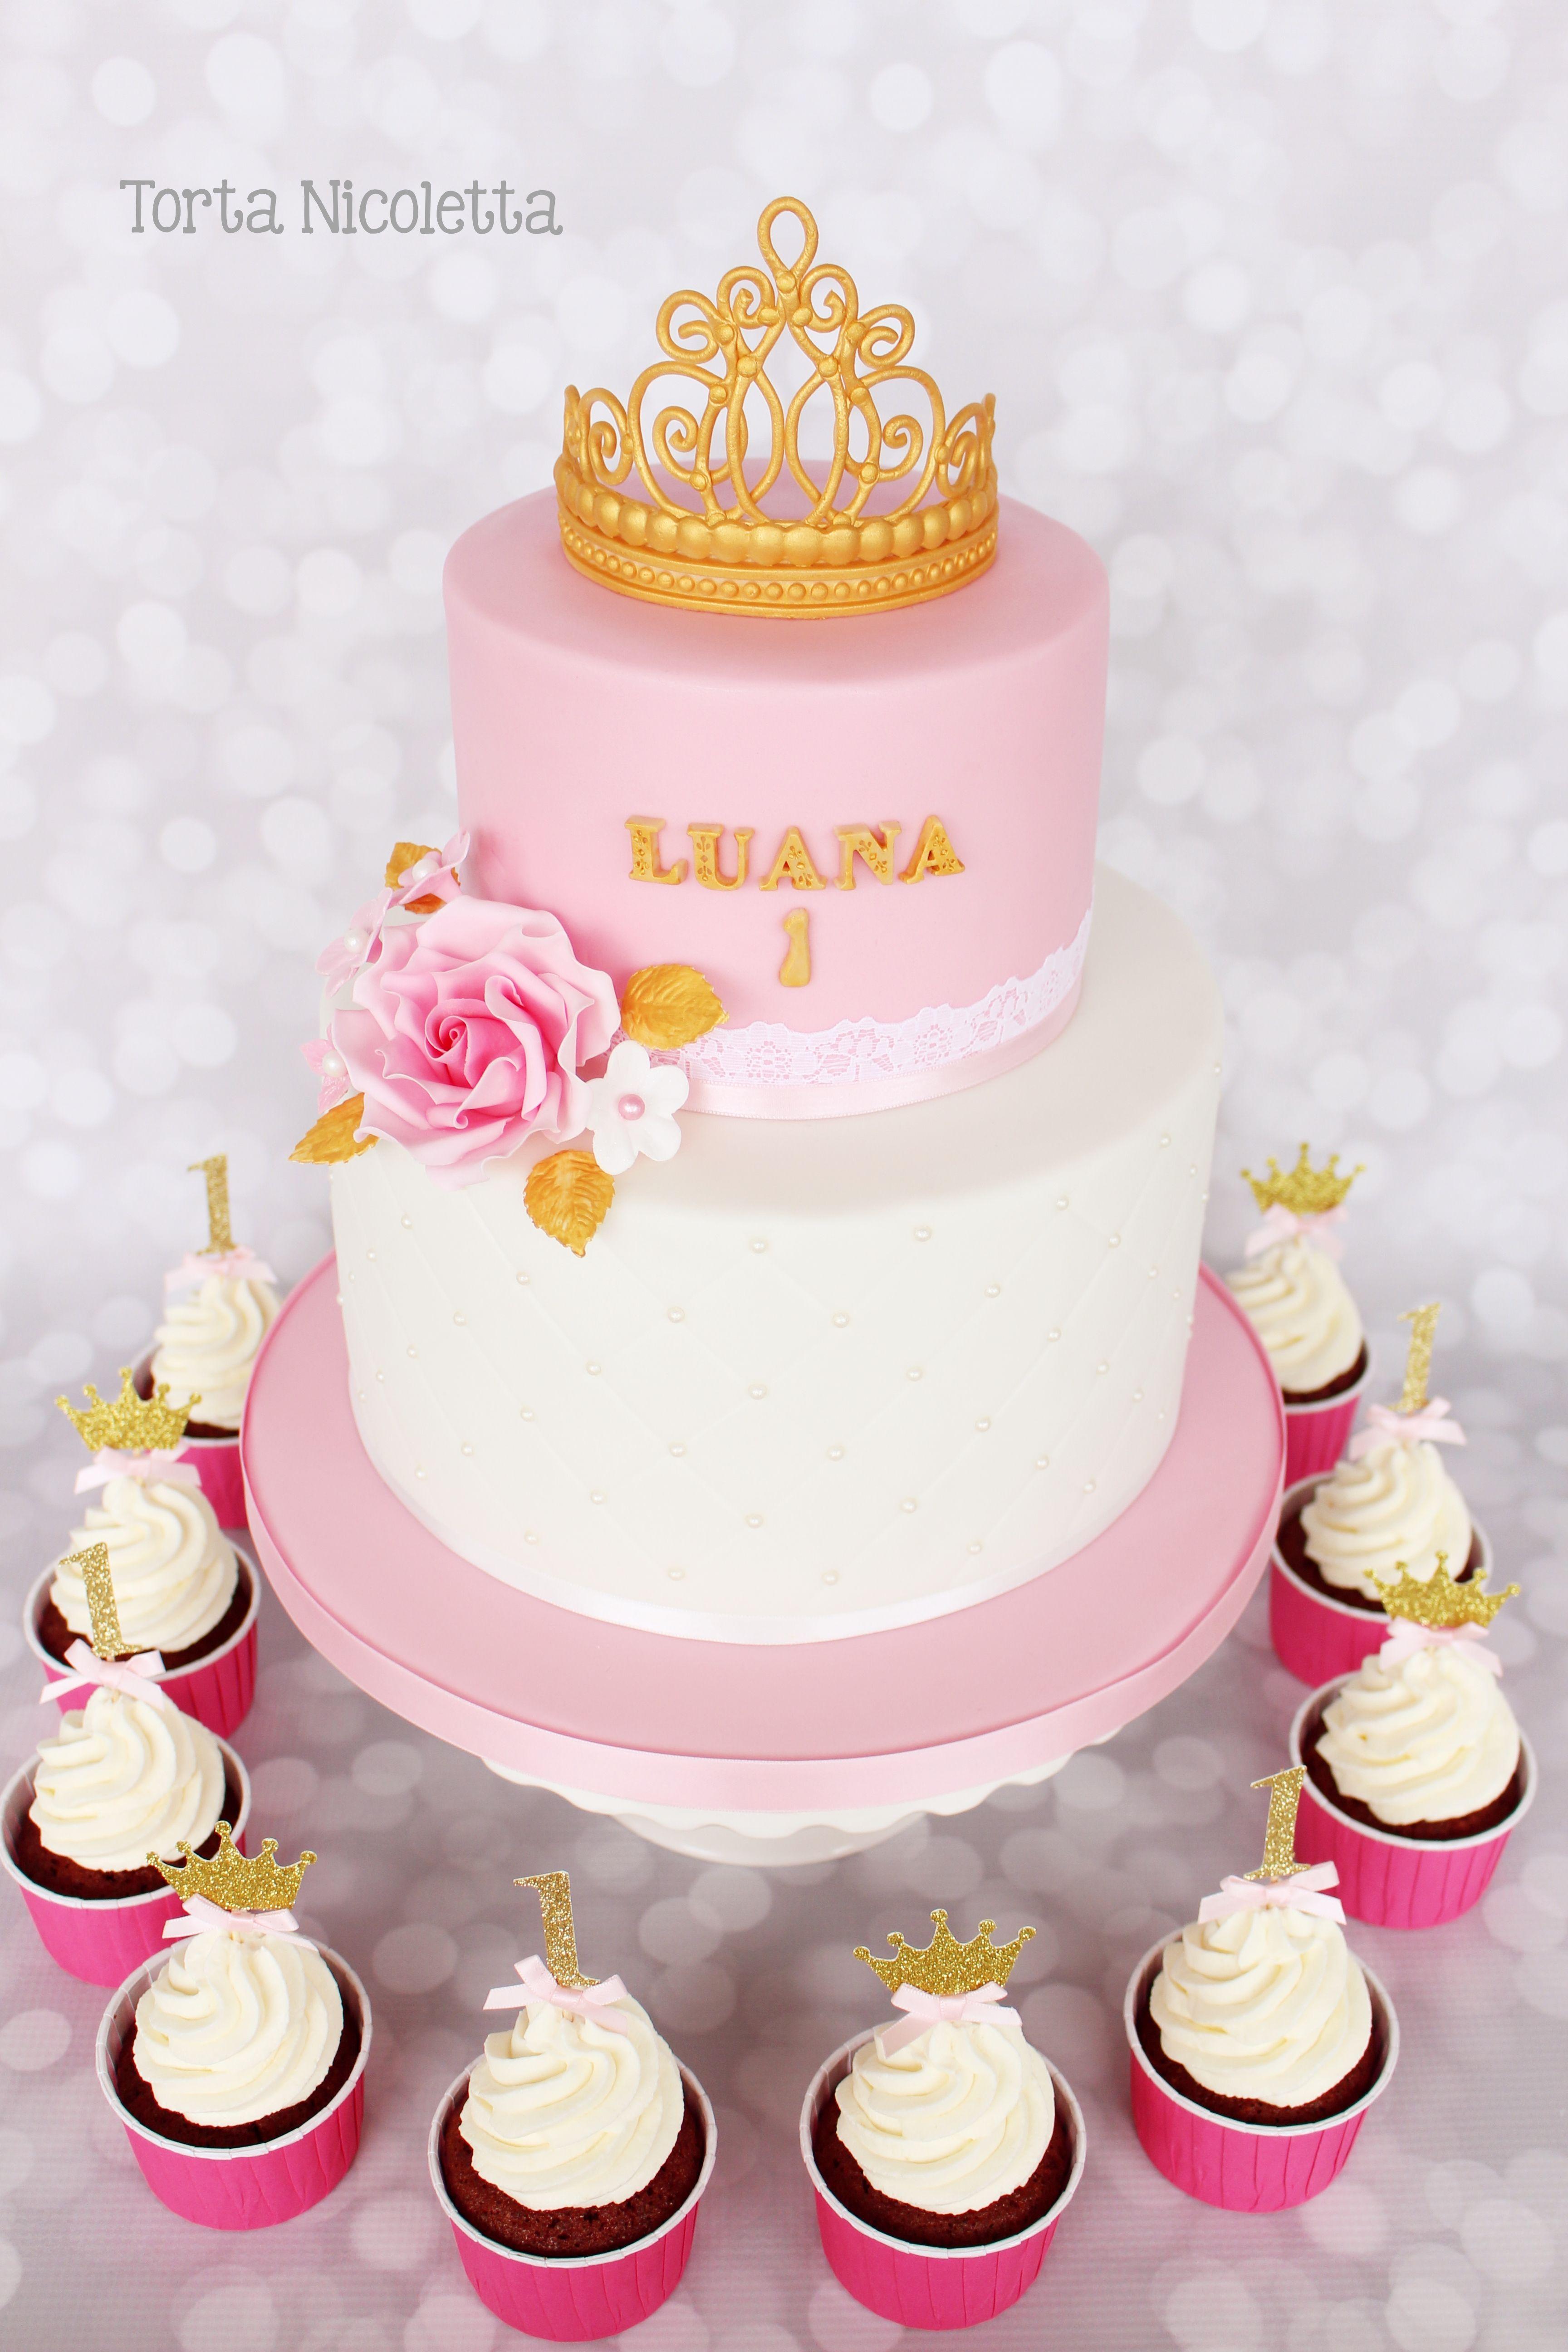 Tiara Cake And Cupcakes